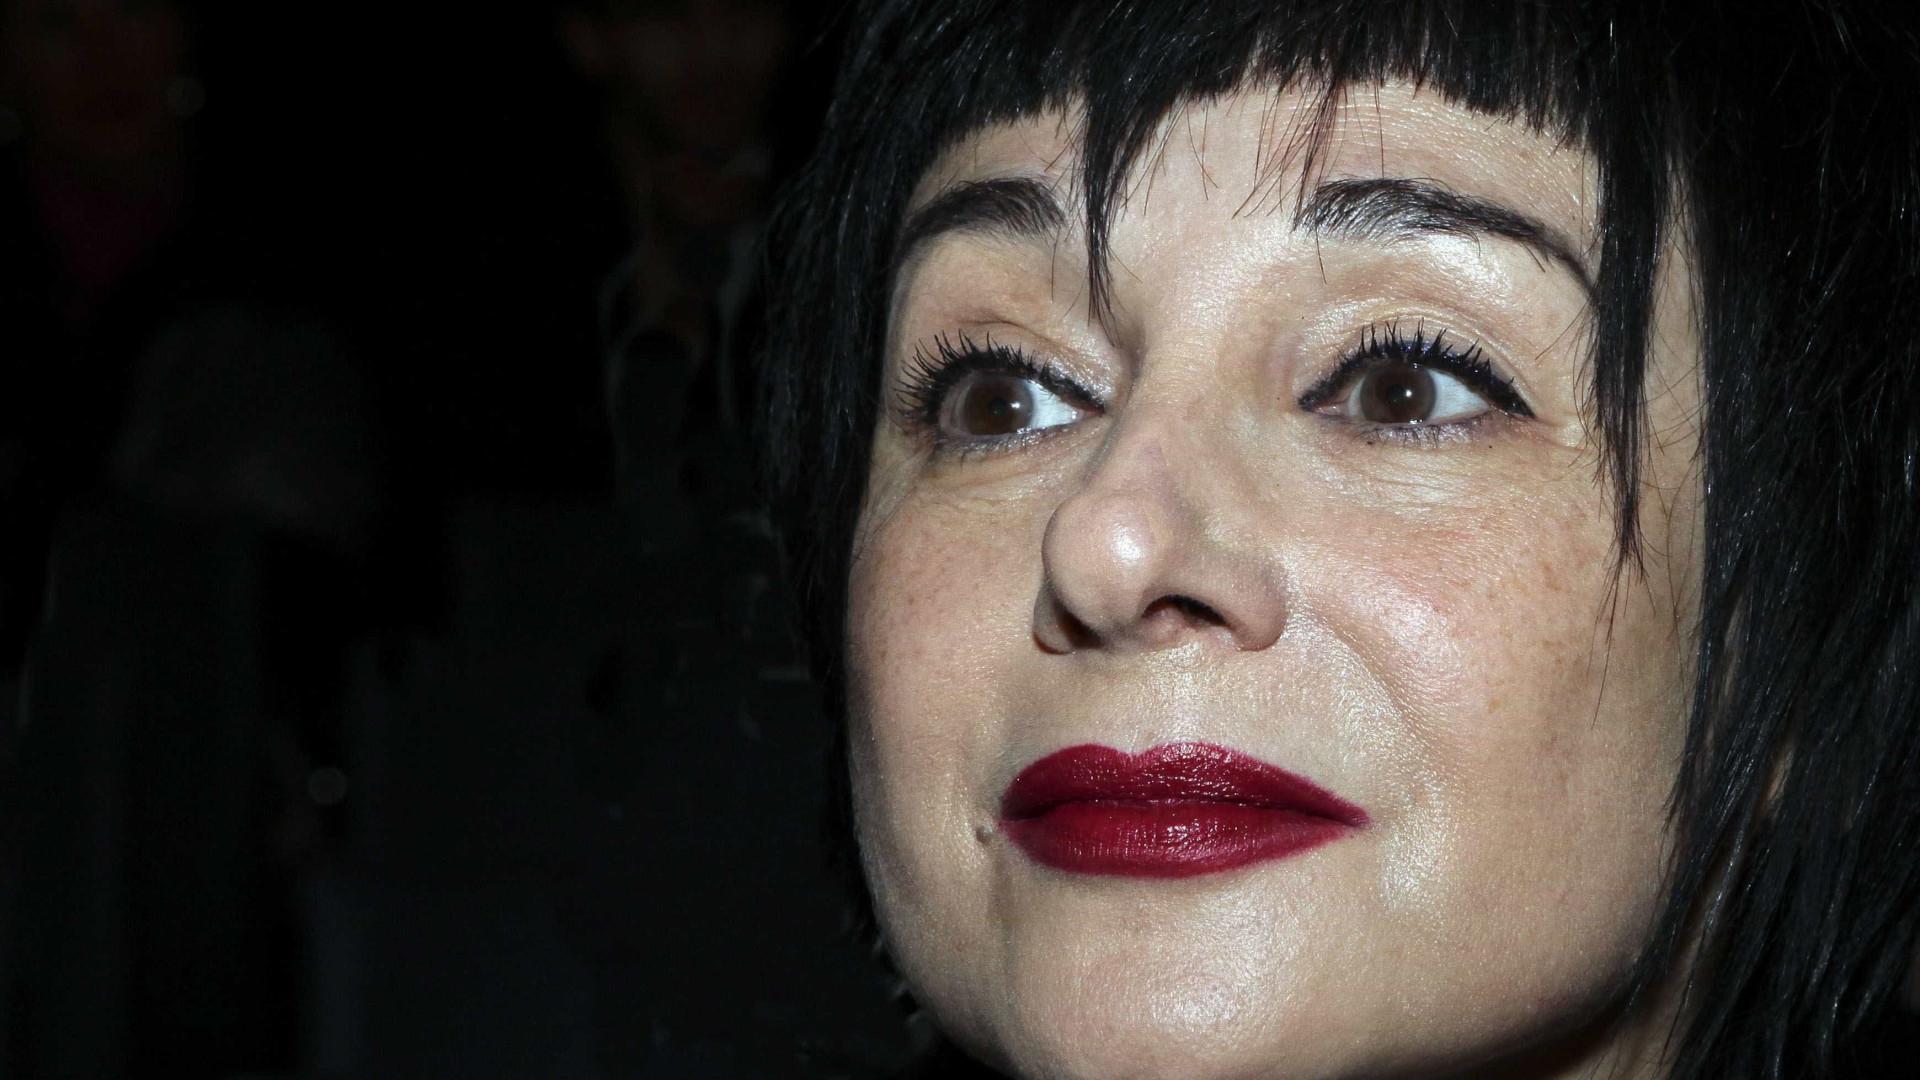 Mísia canta 'Do Primeiro Fado ao Último Tango' sexta-feira em Lisboa